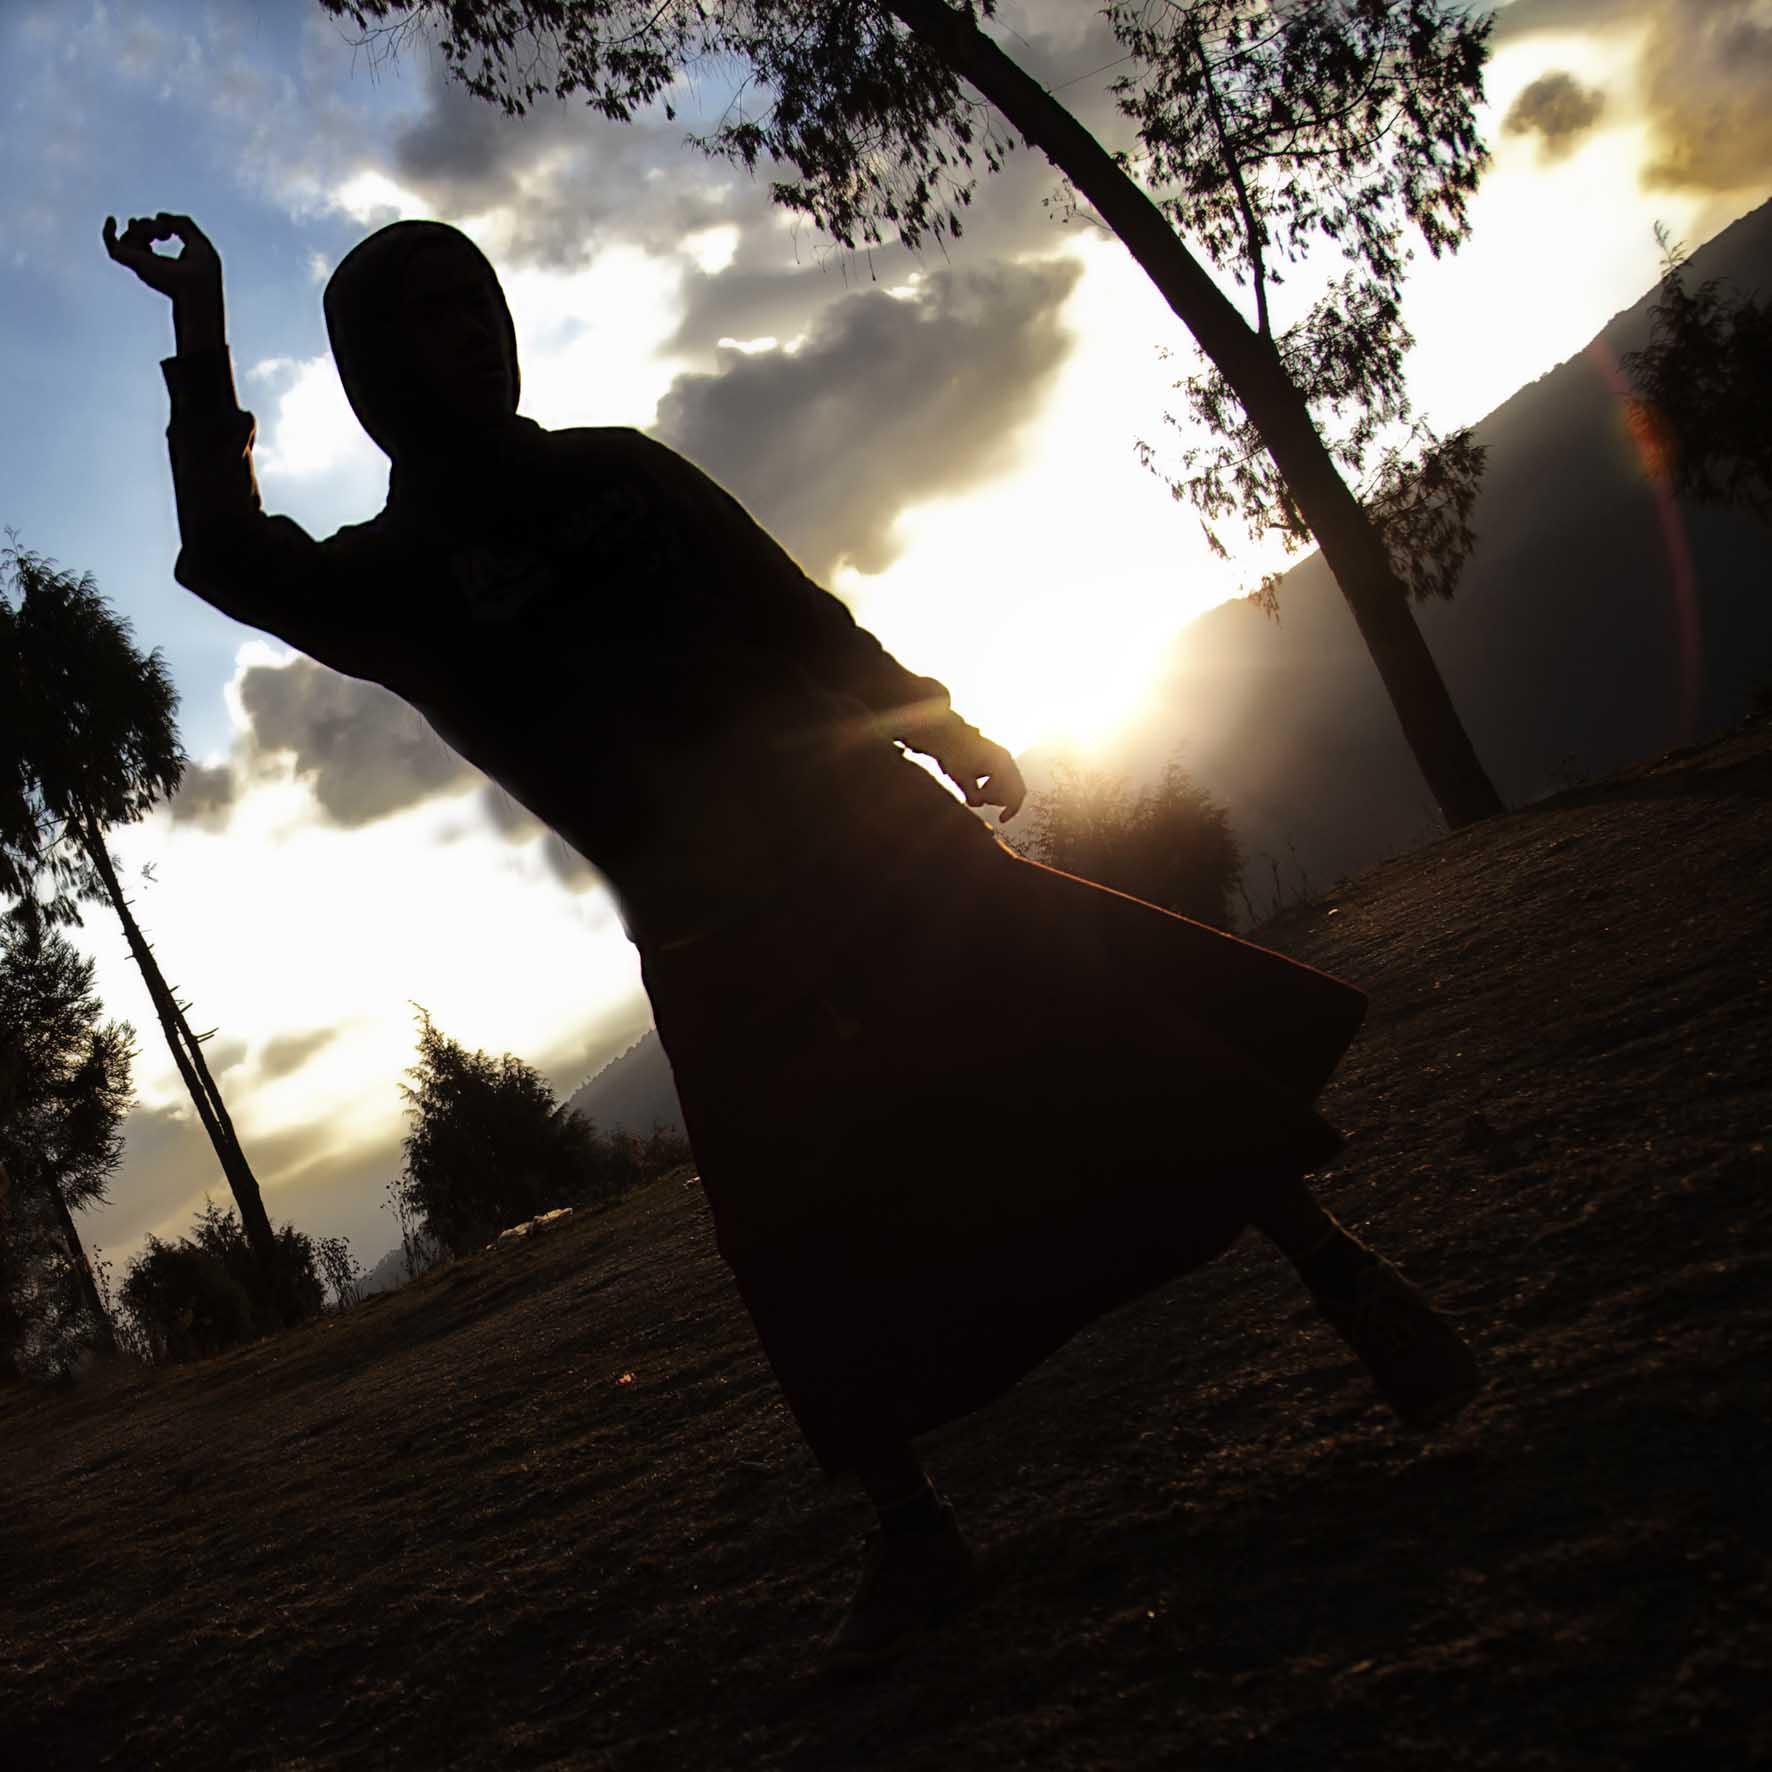 Dancing Monks in Silhouette